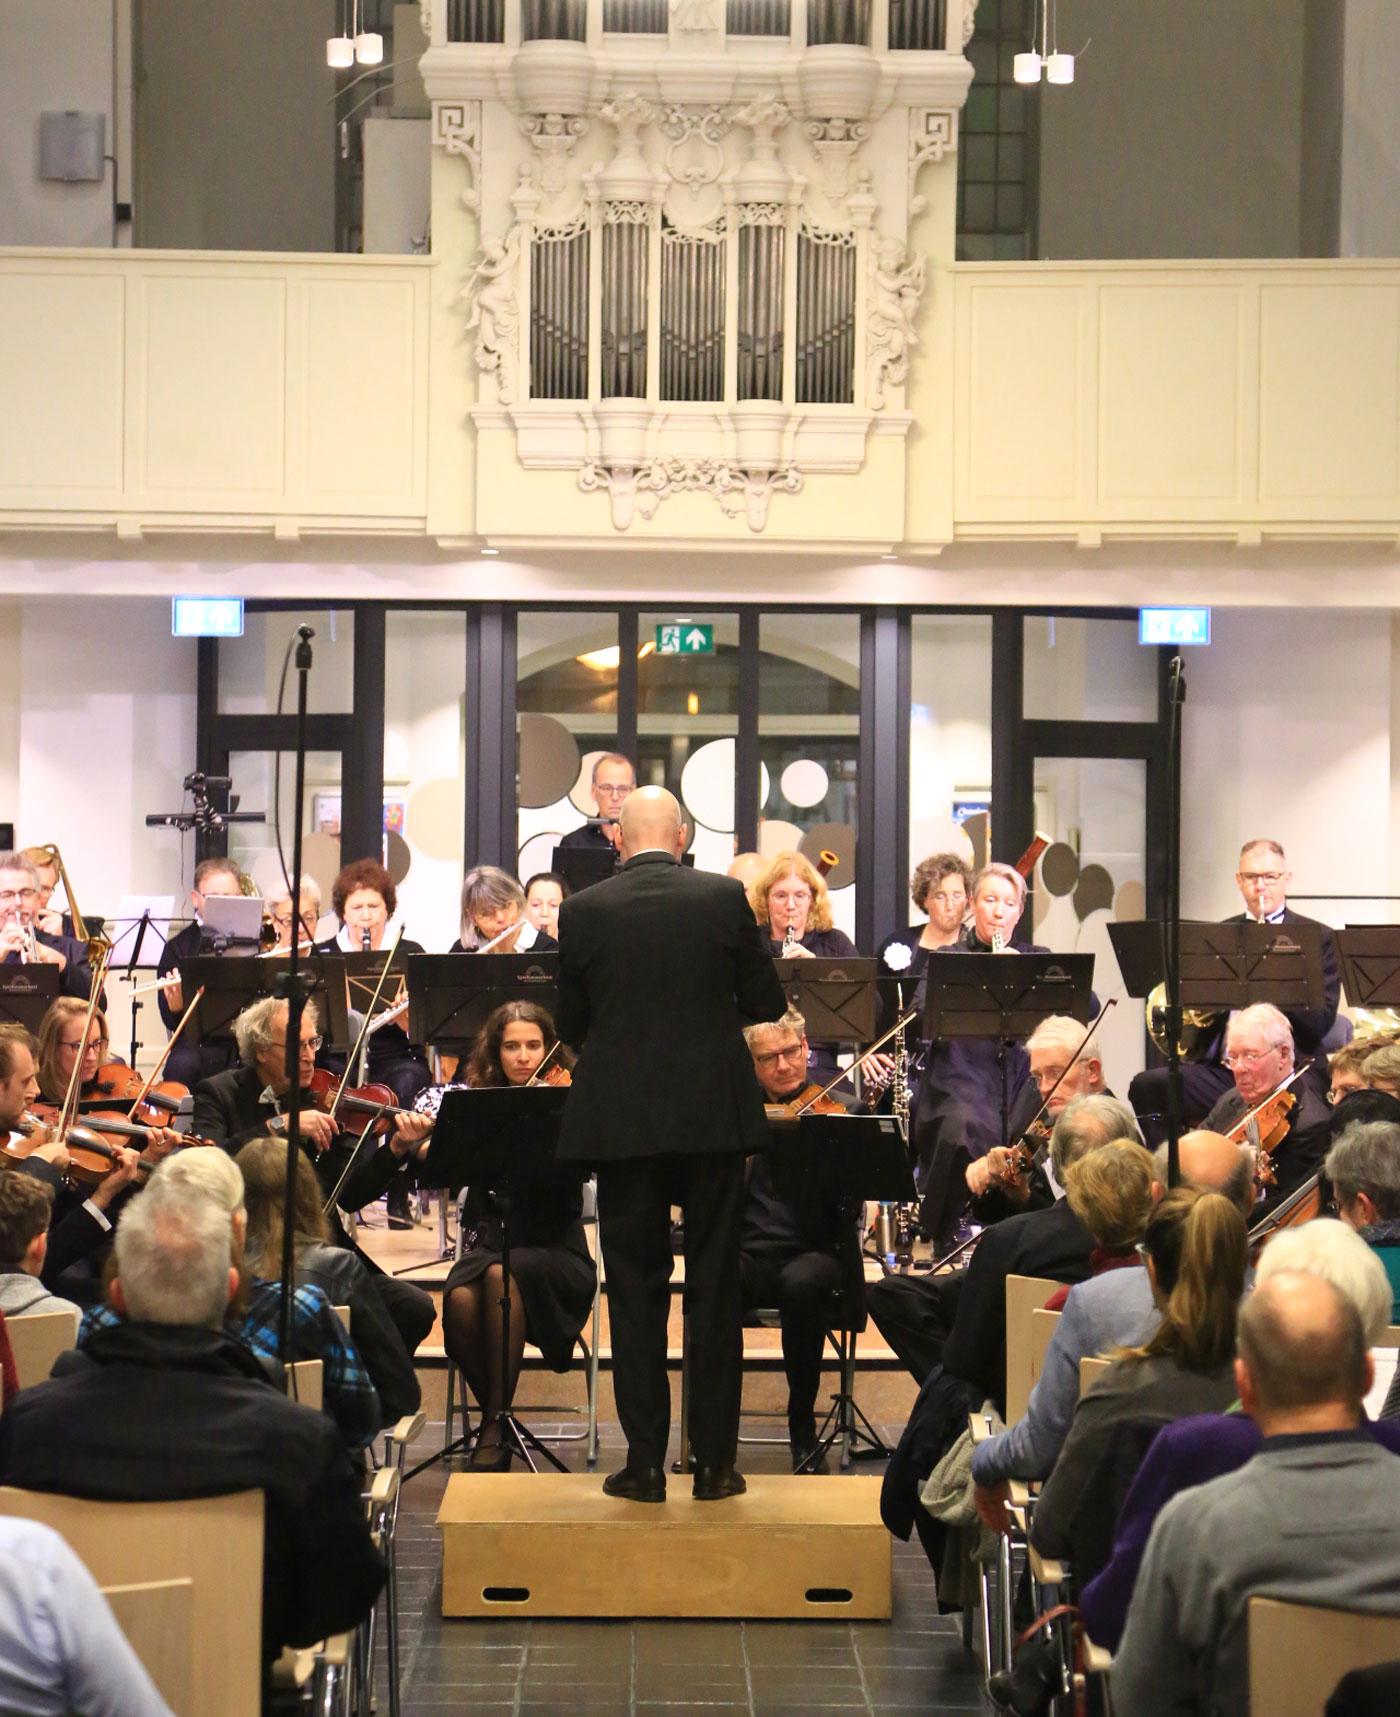 Sob Concert 9 November 2019 Symfonieorkest Bloembollenstreek